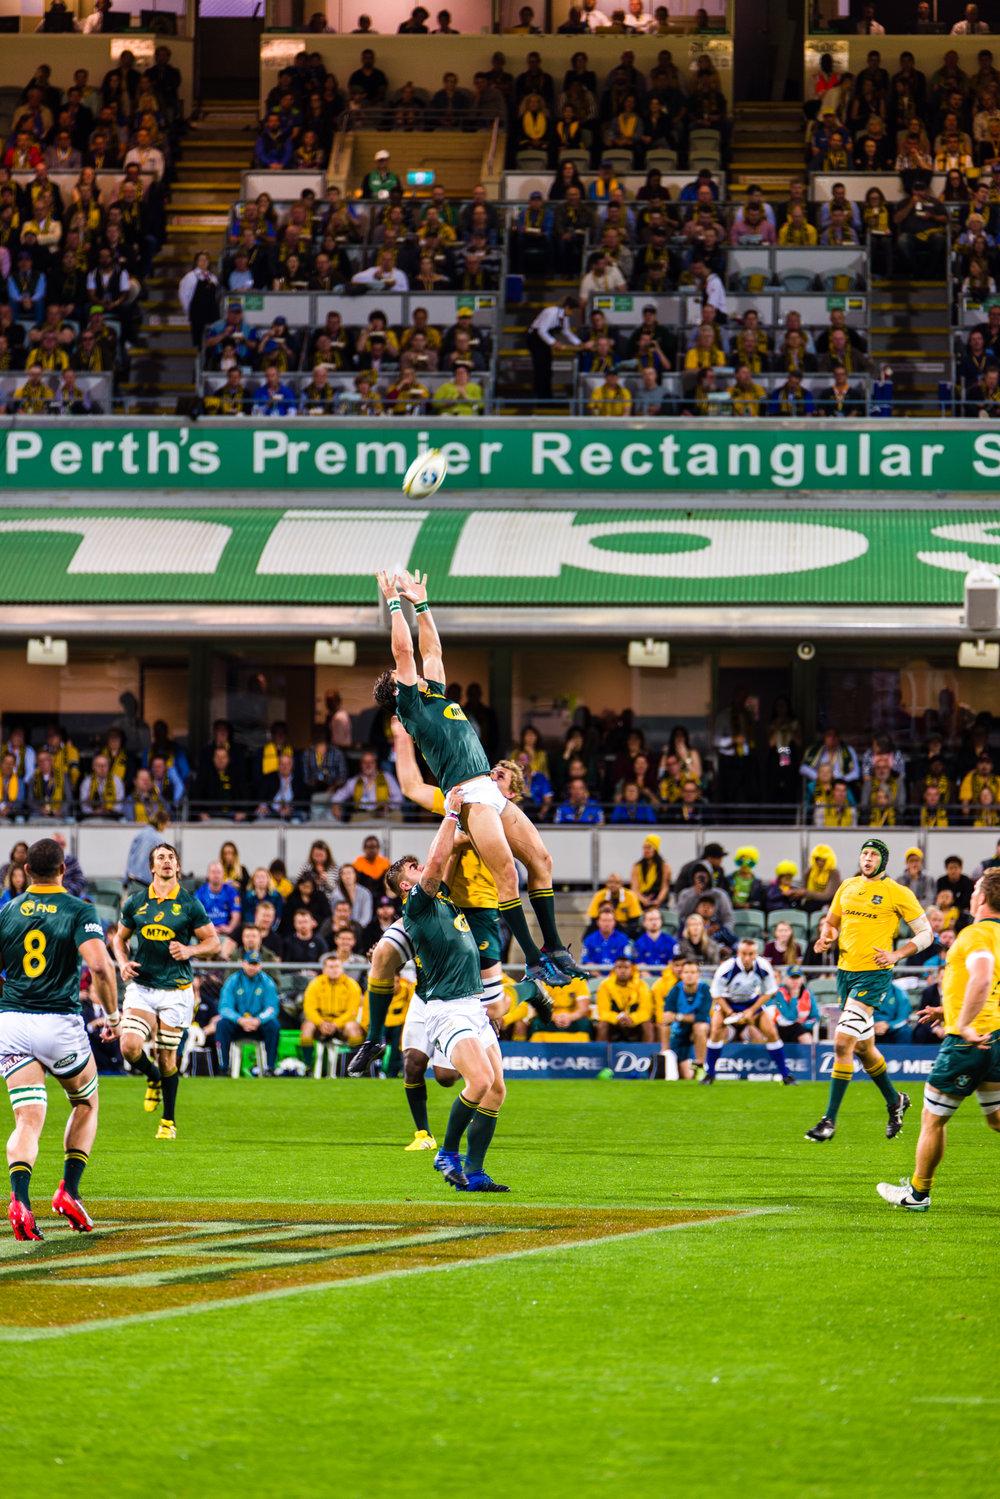 Spyrides_Kyle_RugbyChampionship_Perth_9.9.2017_DSC7231.jpg